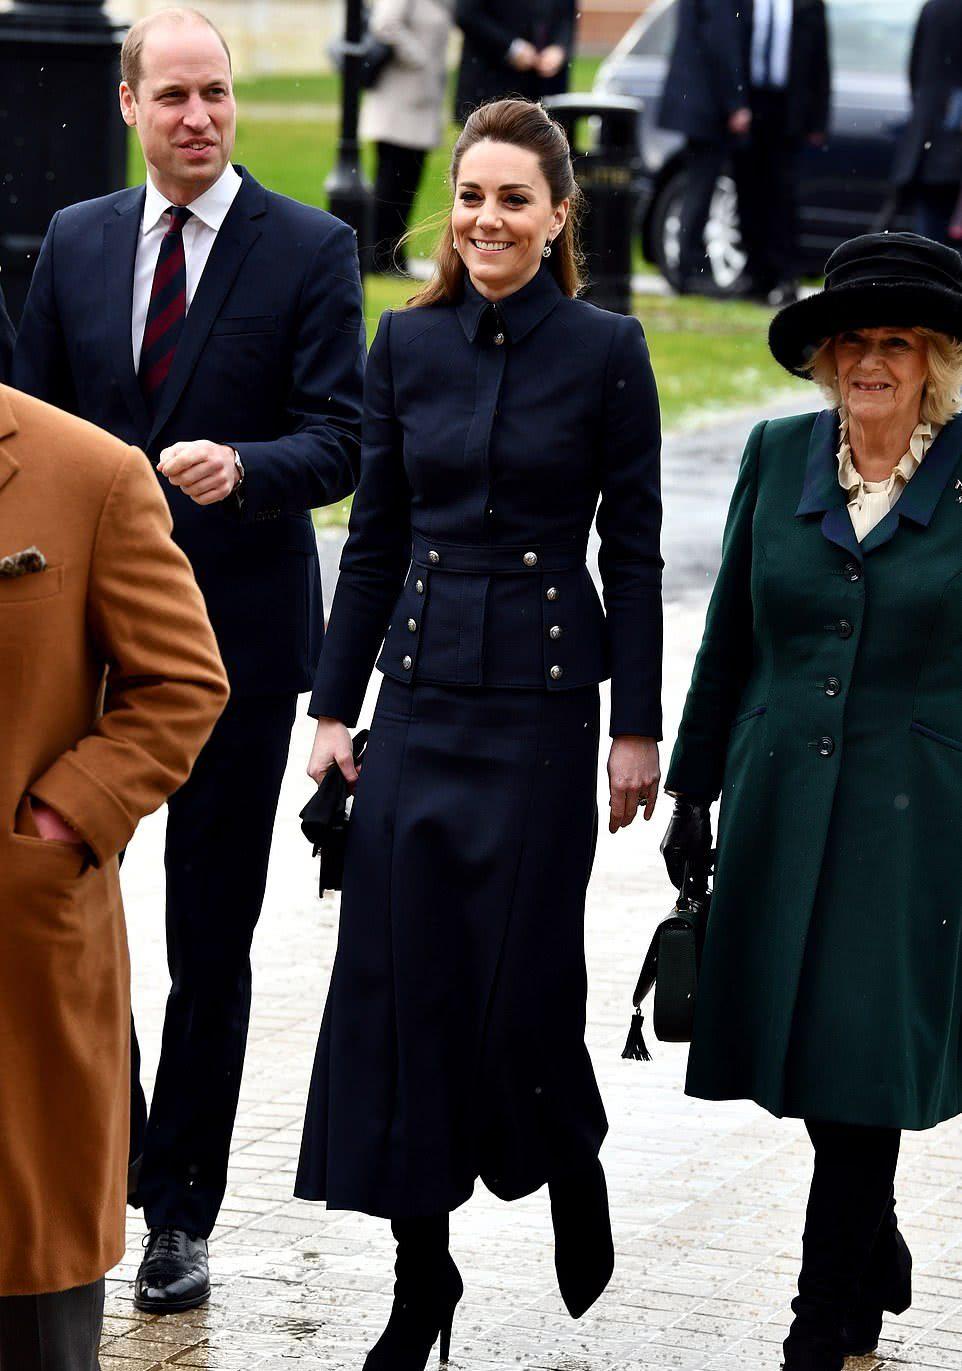 <b>凯特王妃老得太快让人心疼!穿深蓝套装没了曲线感,太显干瘪啦</b>